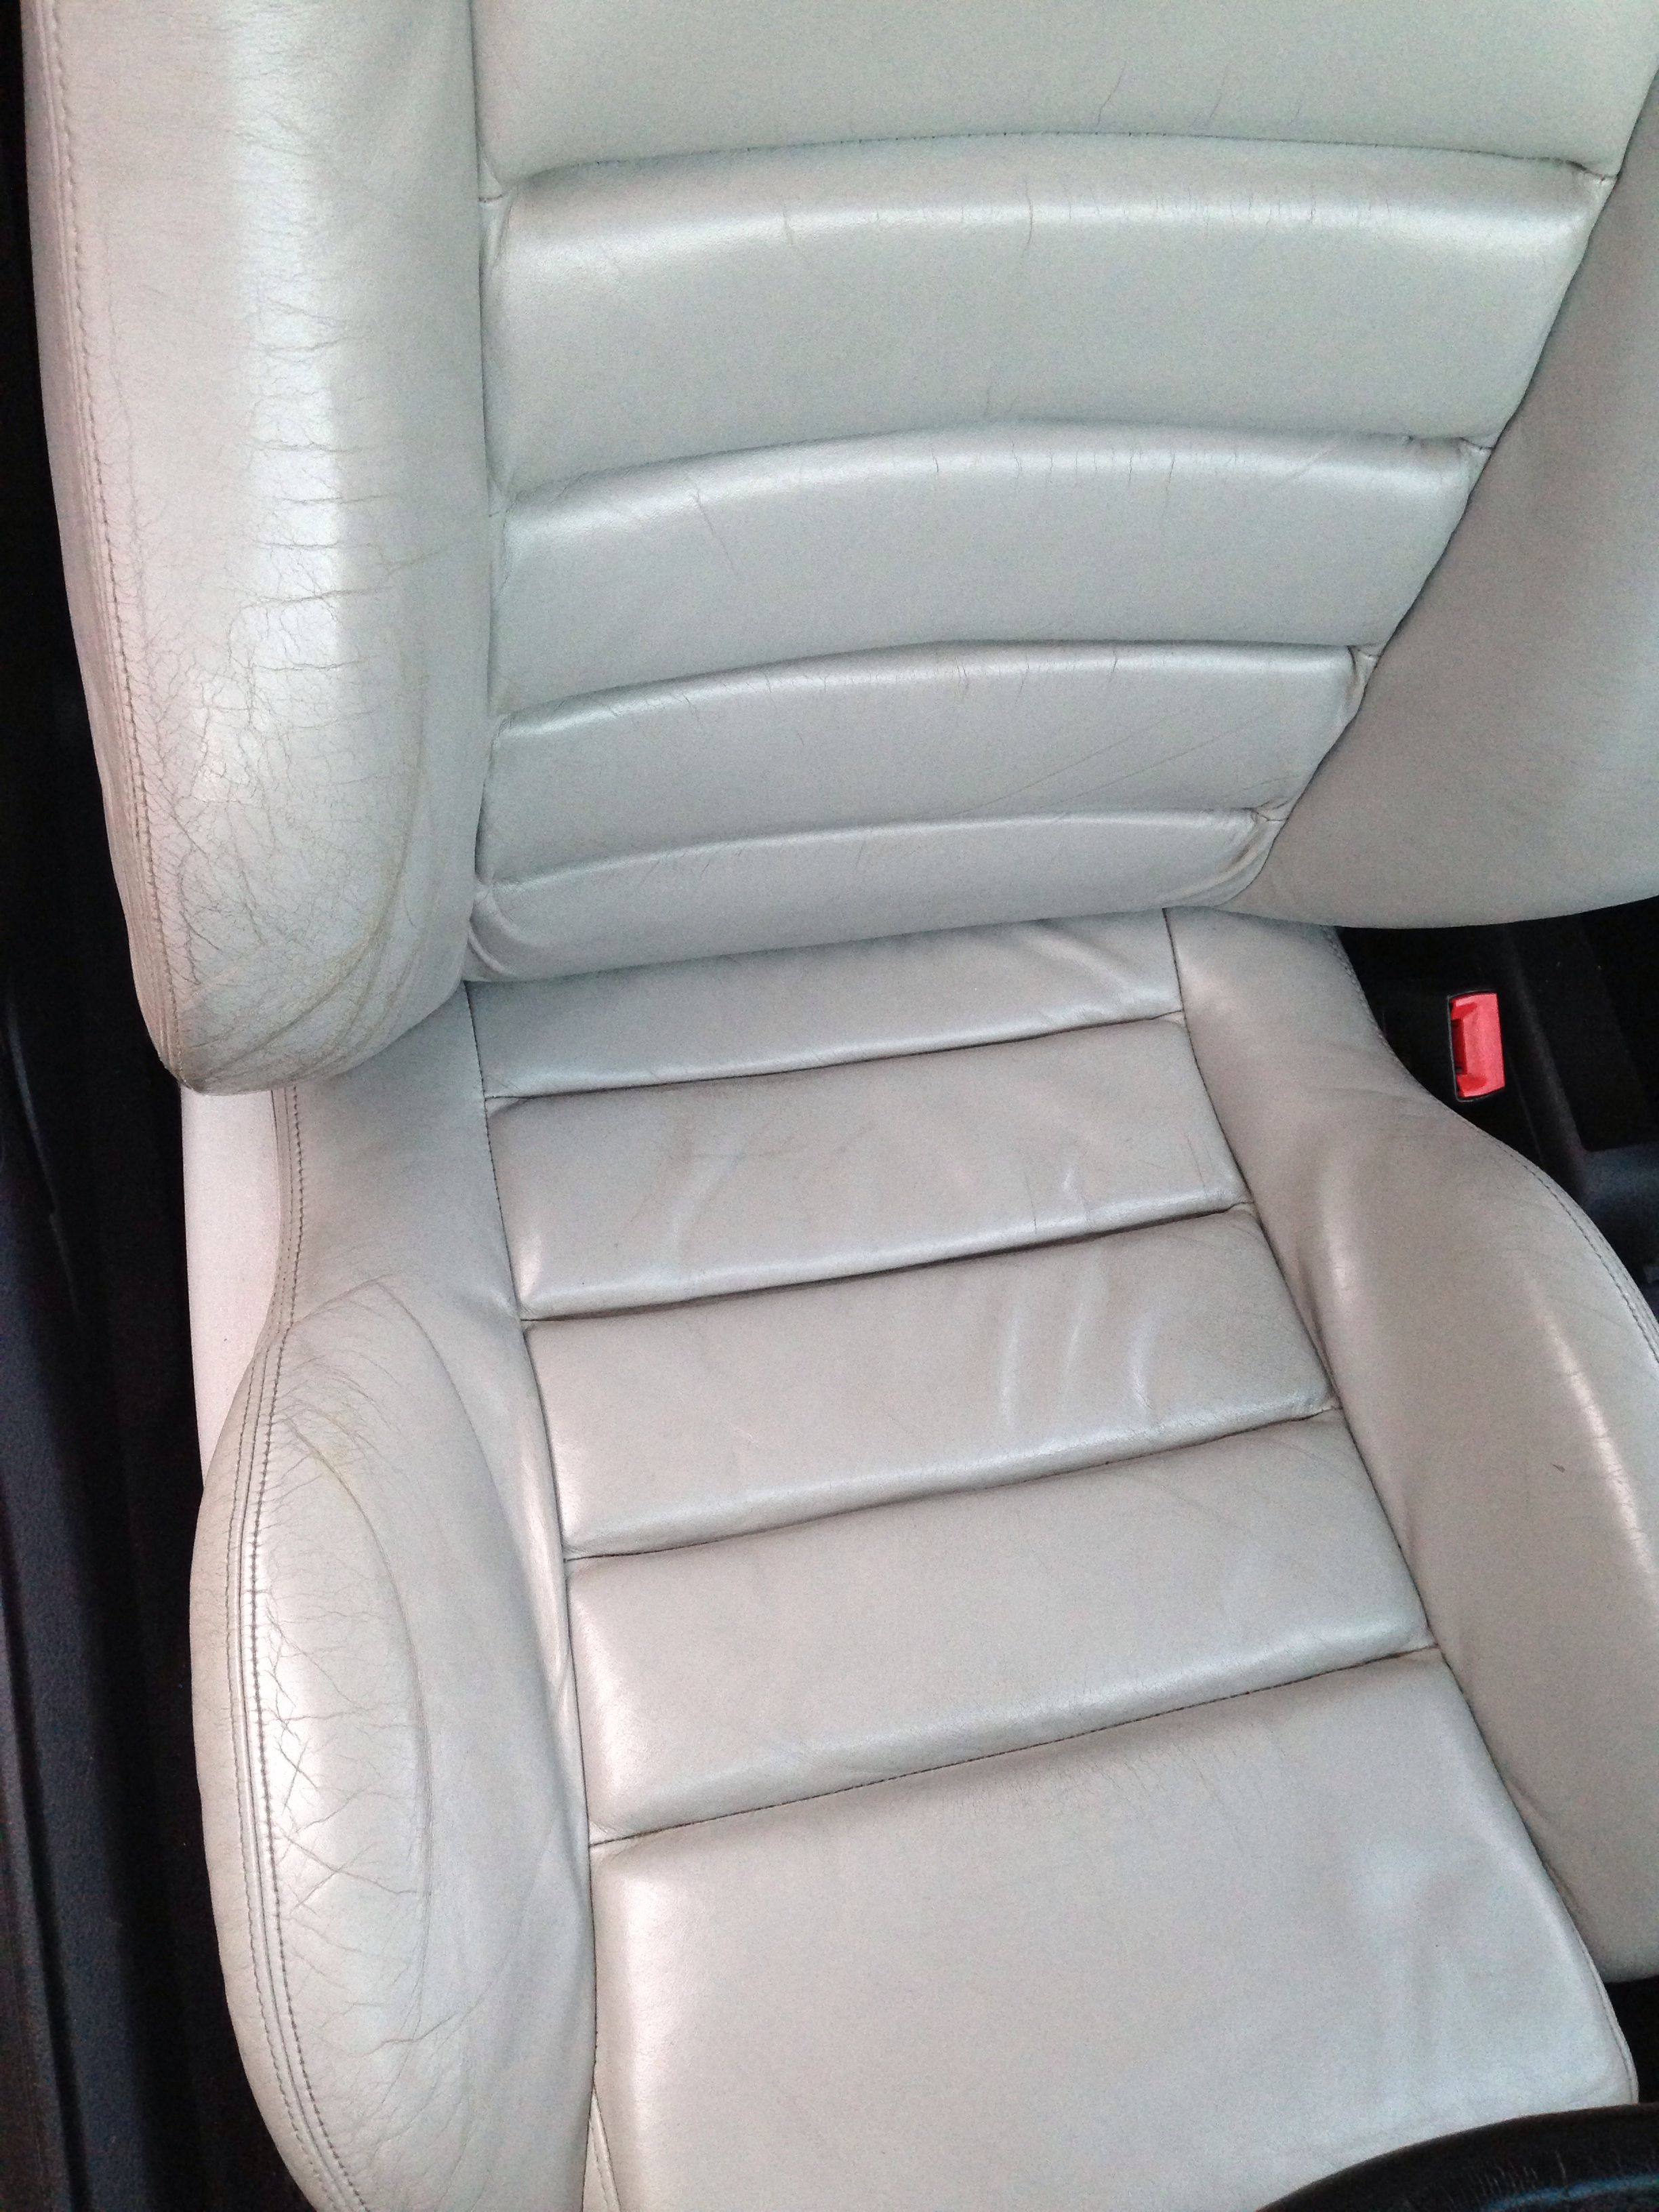 Superb Audi B5 S4 Leather Seat Before Restoration Leather Car Spiritservingveterans Wood Chair Design Ideas Spiritservingveteransorg